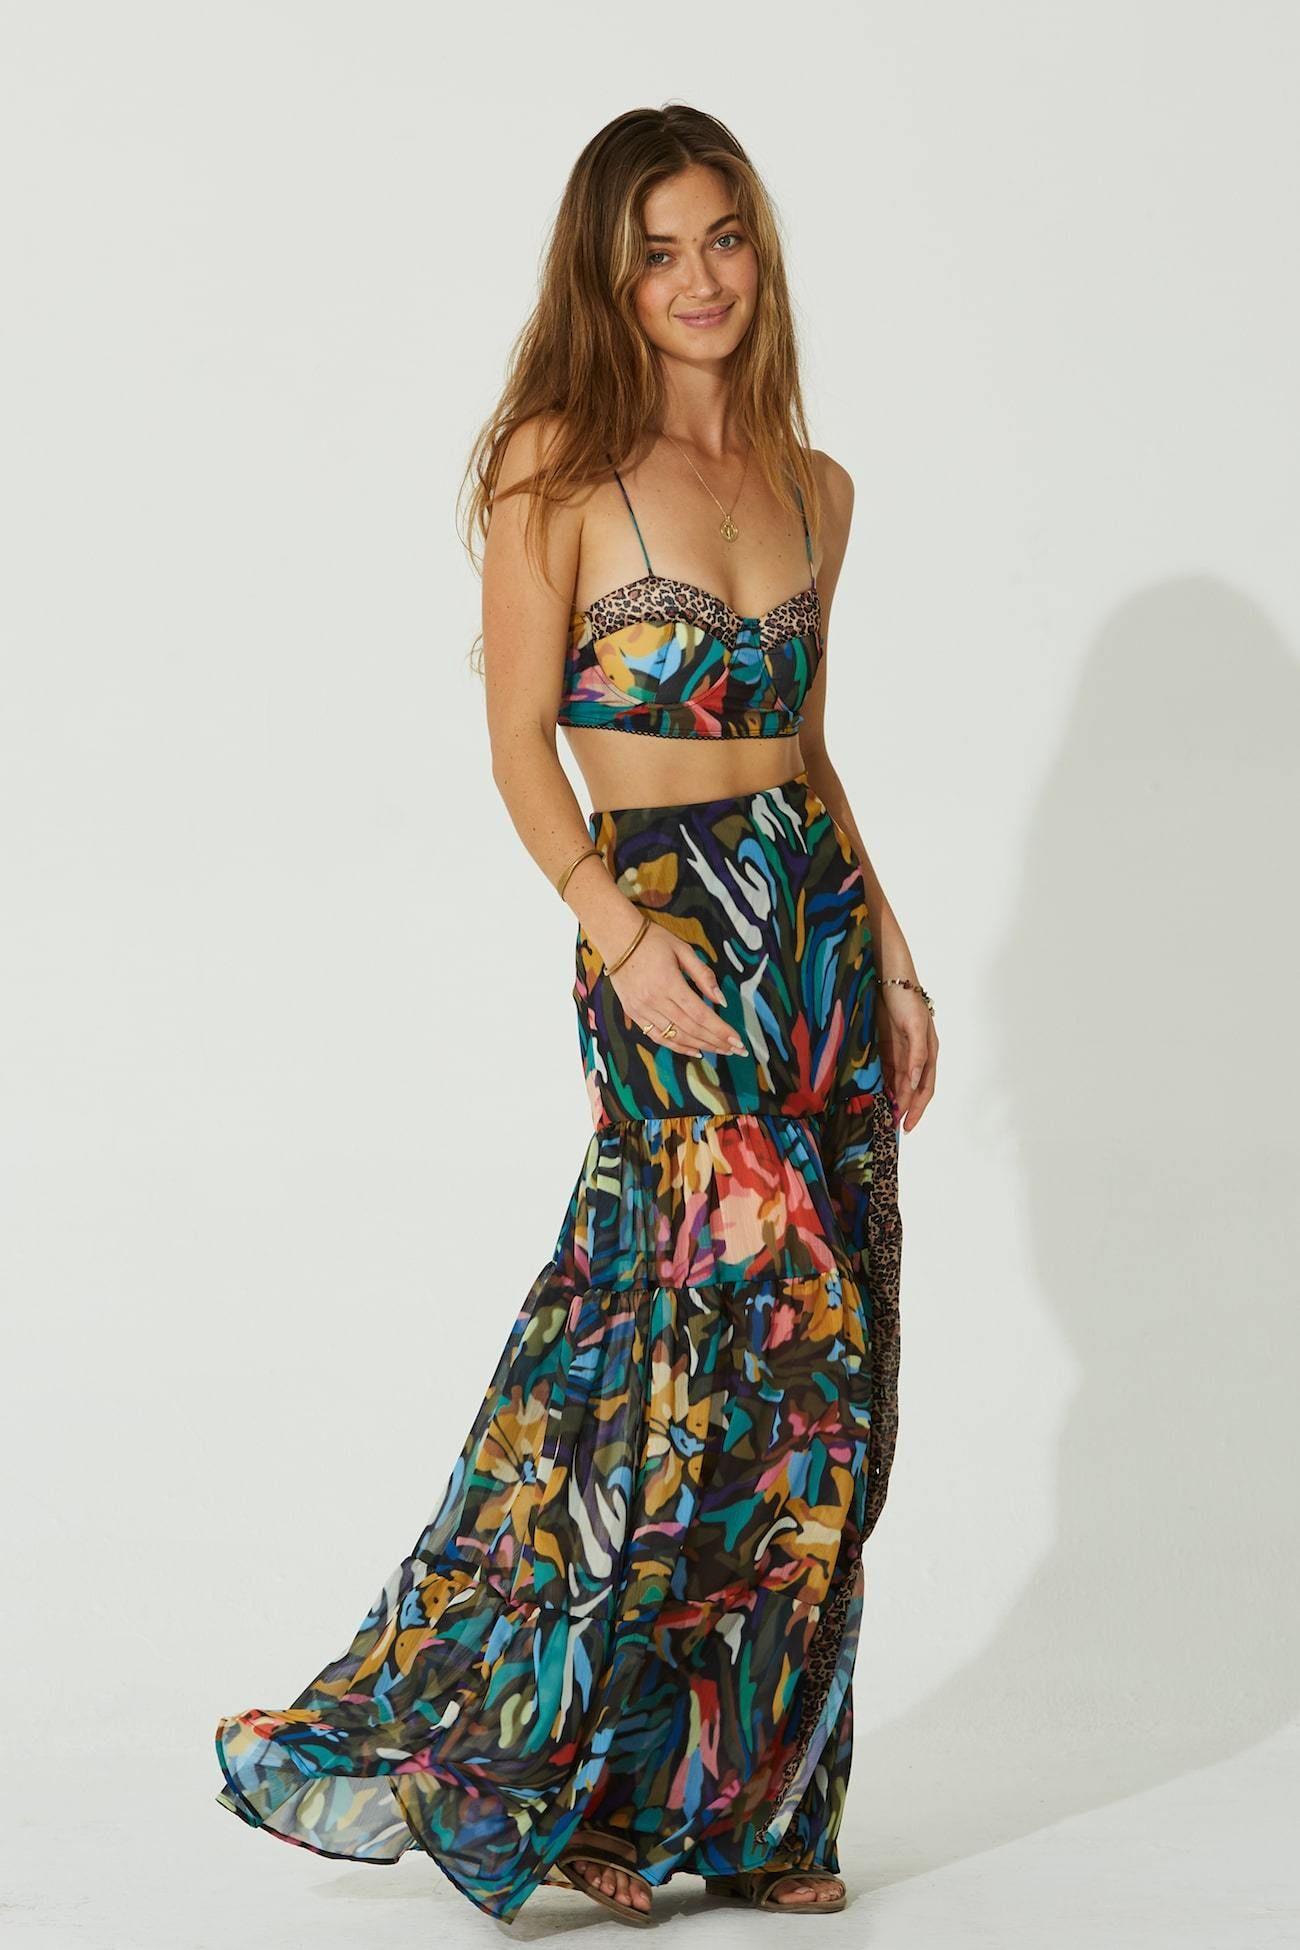 Danara Maxi Skirt In 2021 Boho Chic Style Outfits Maxi Skirt Curvy Boho [ 1950 x 1300 Pixel ]